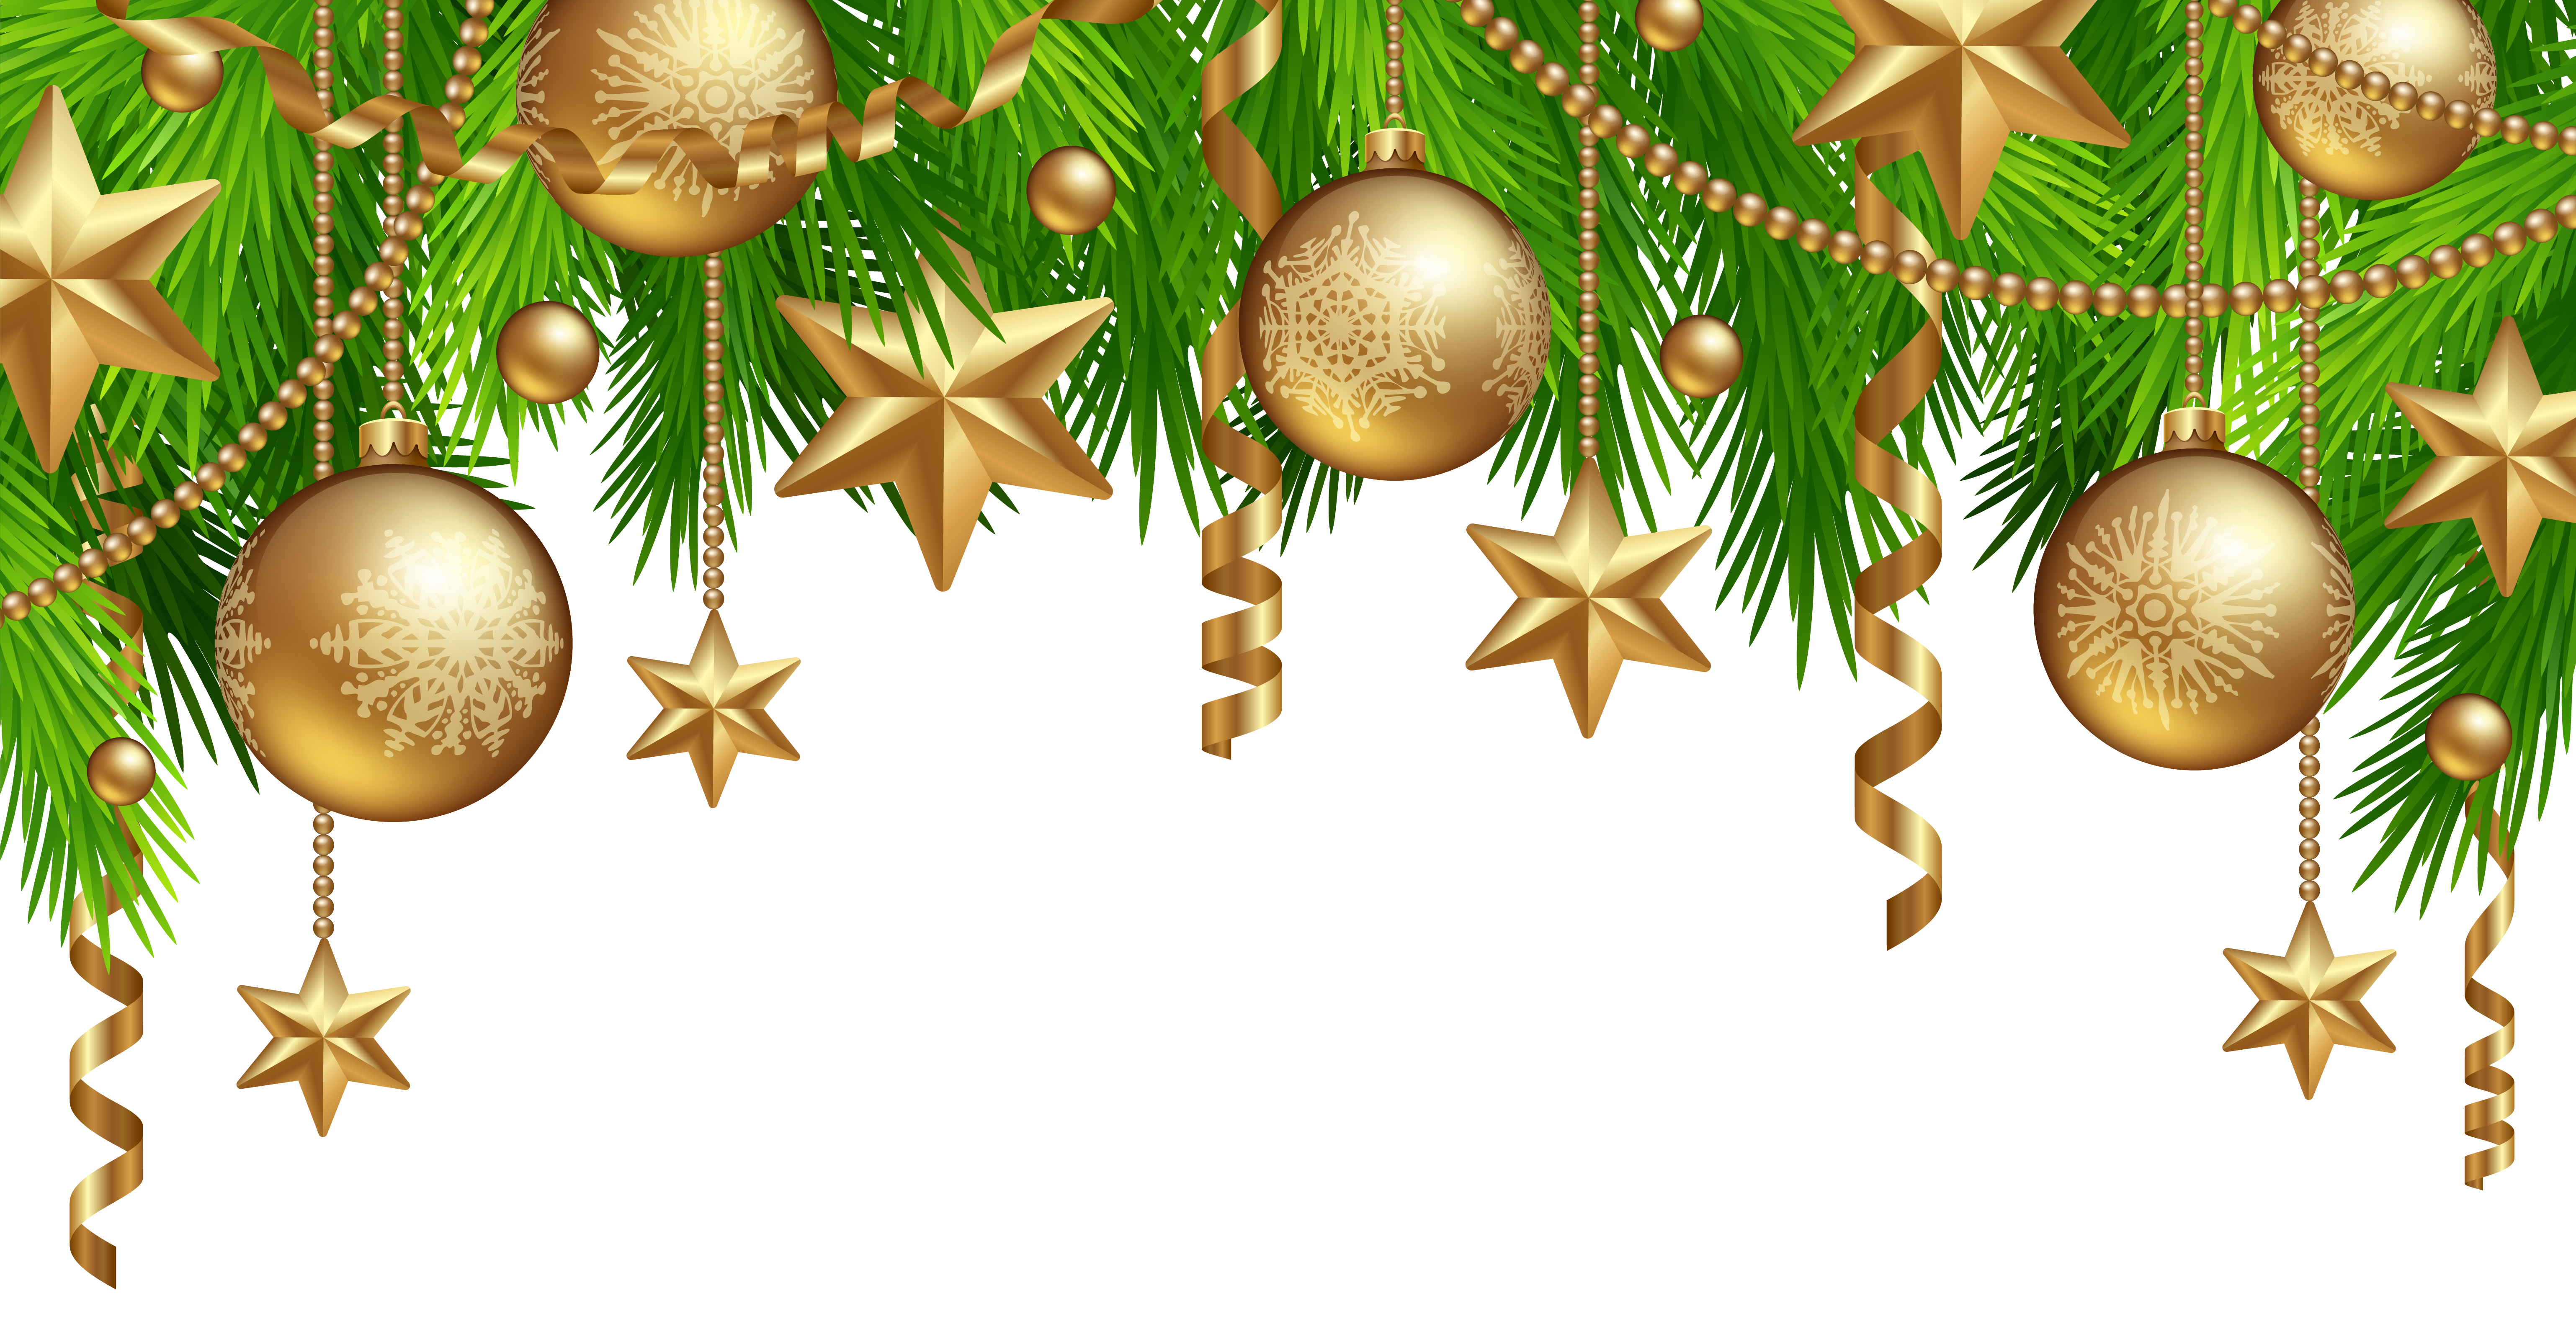 Christmas Border Decor PNG Clipart Image.